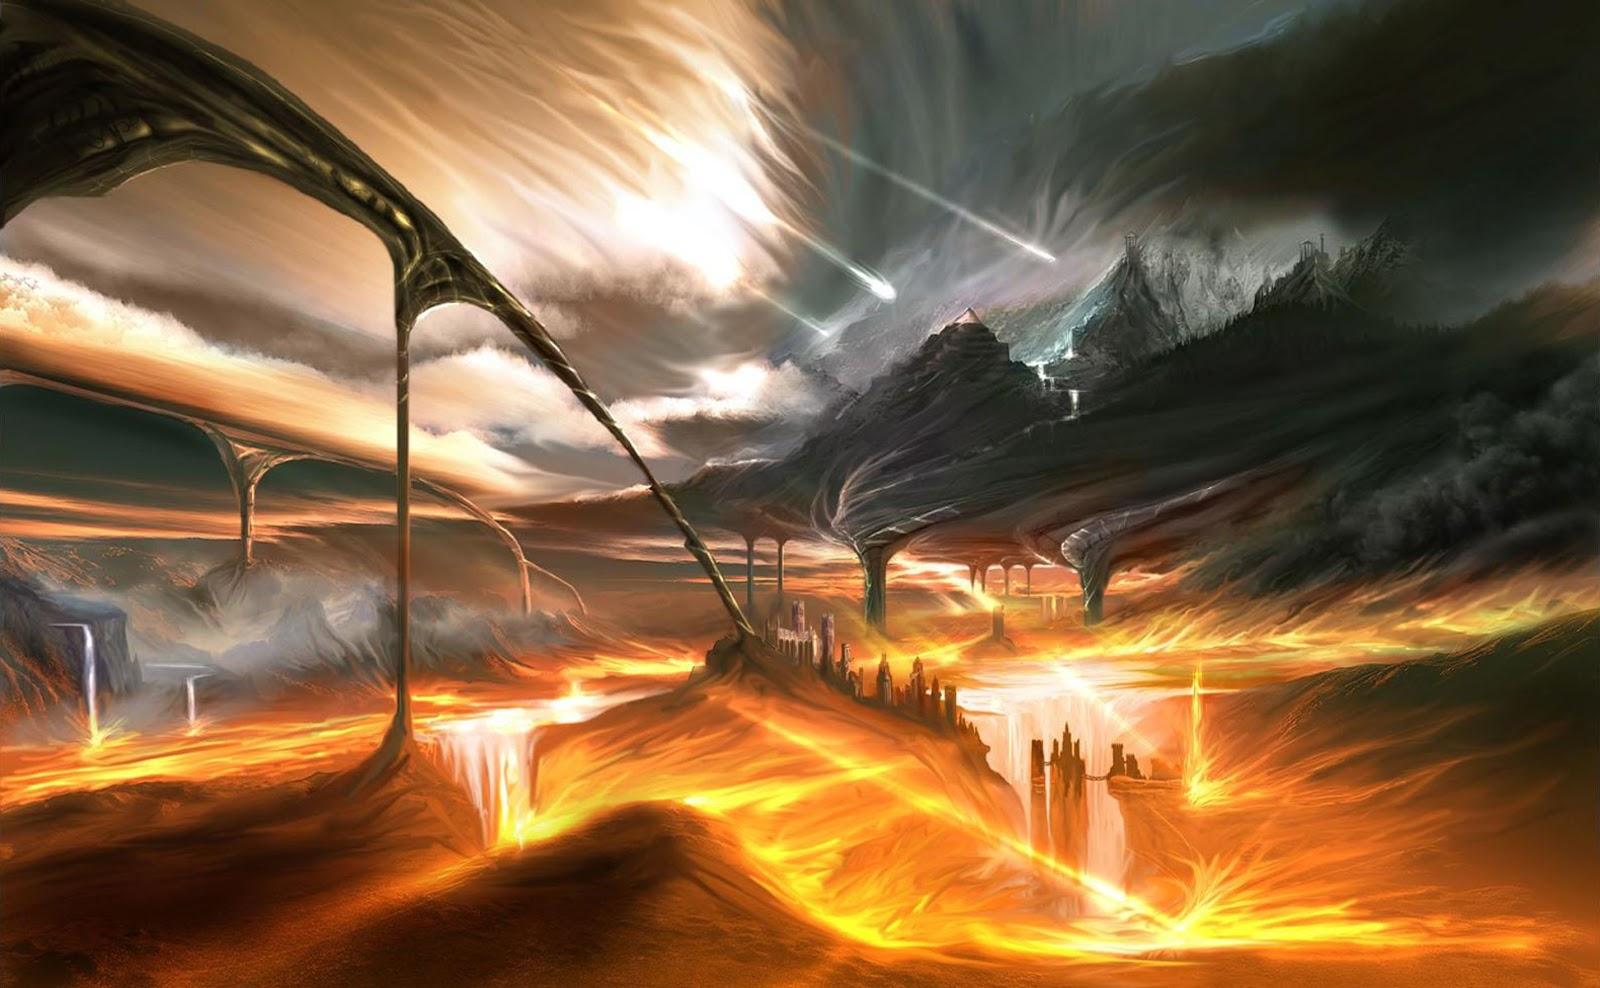 Fire domain